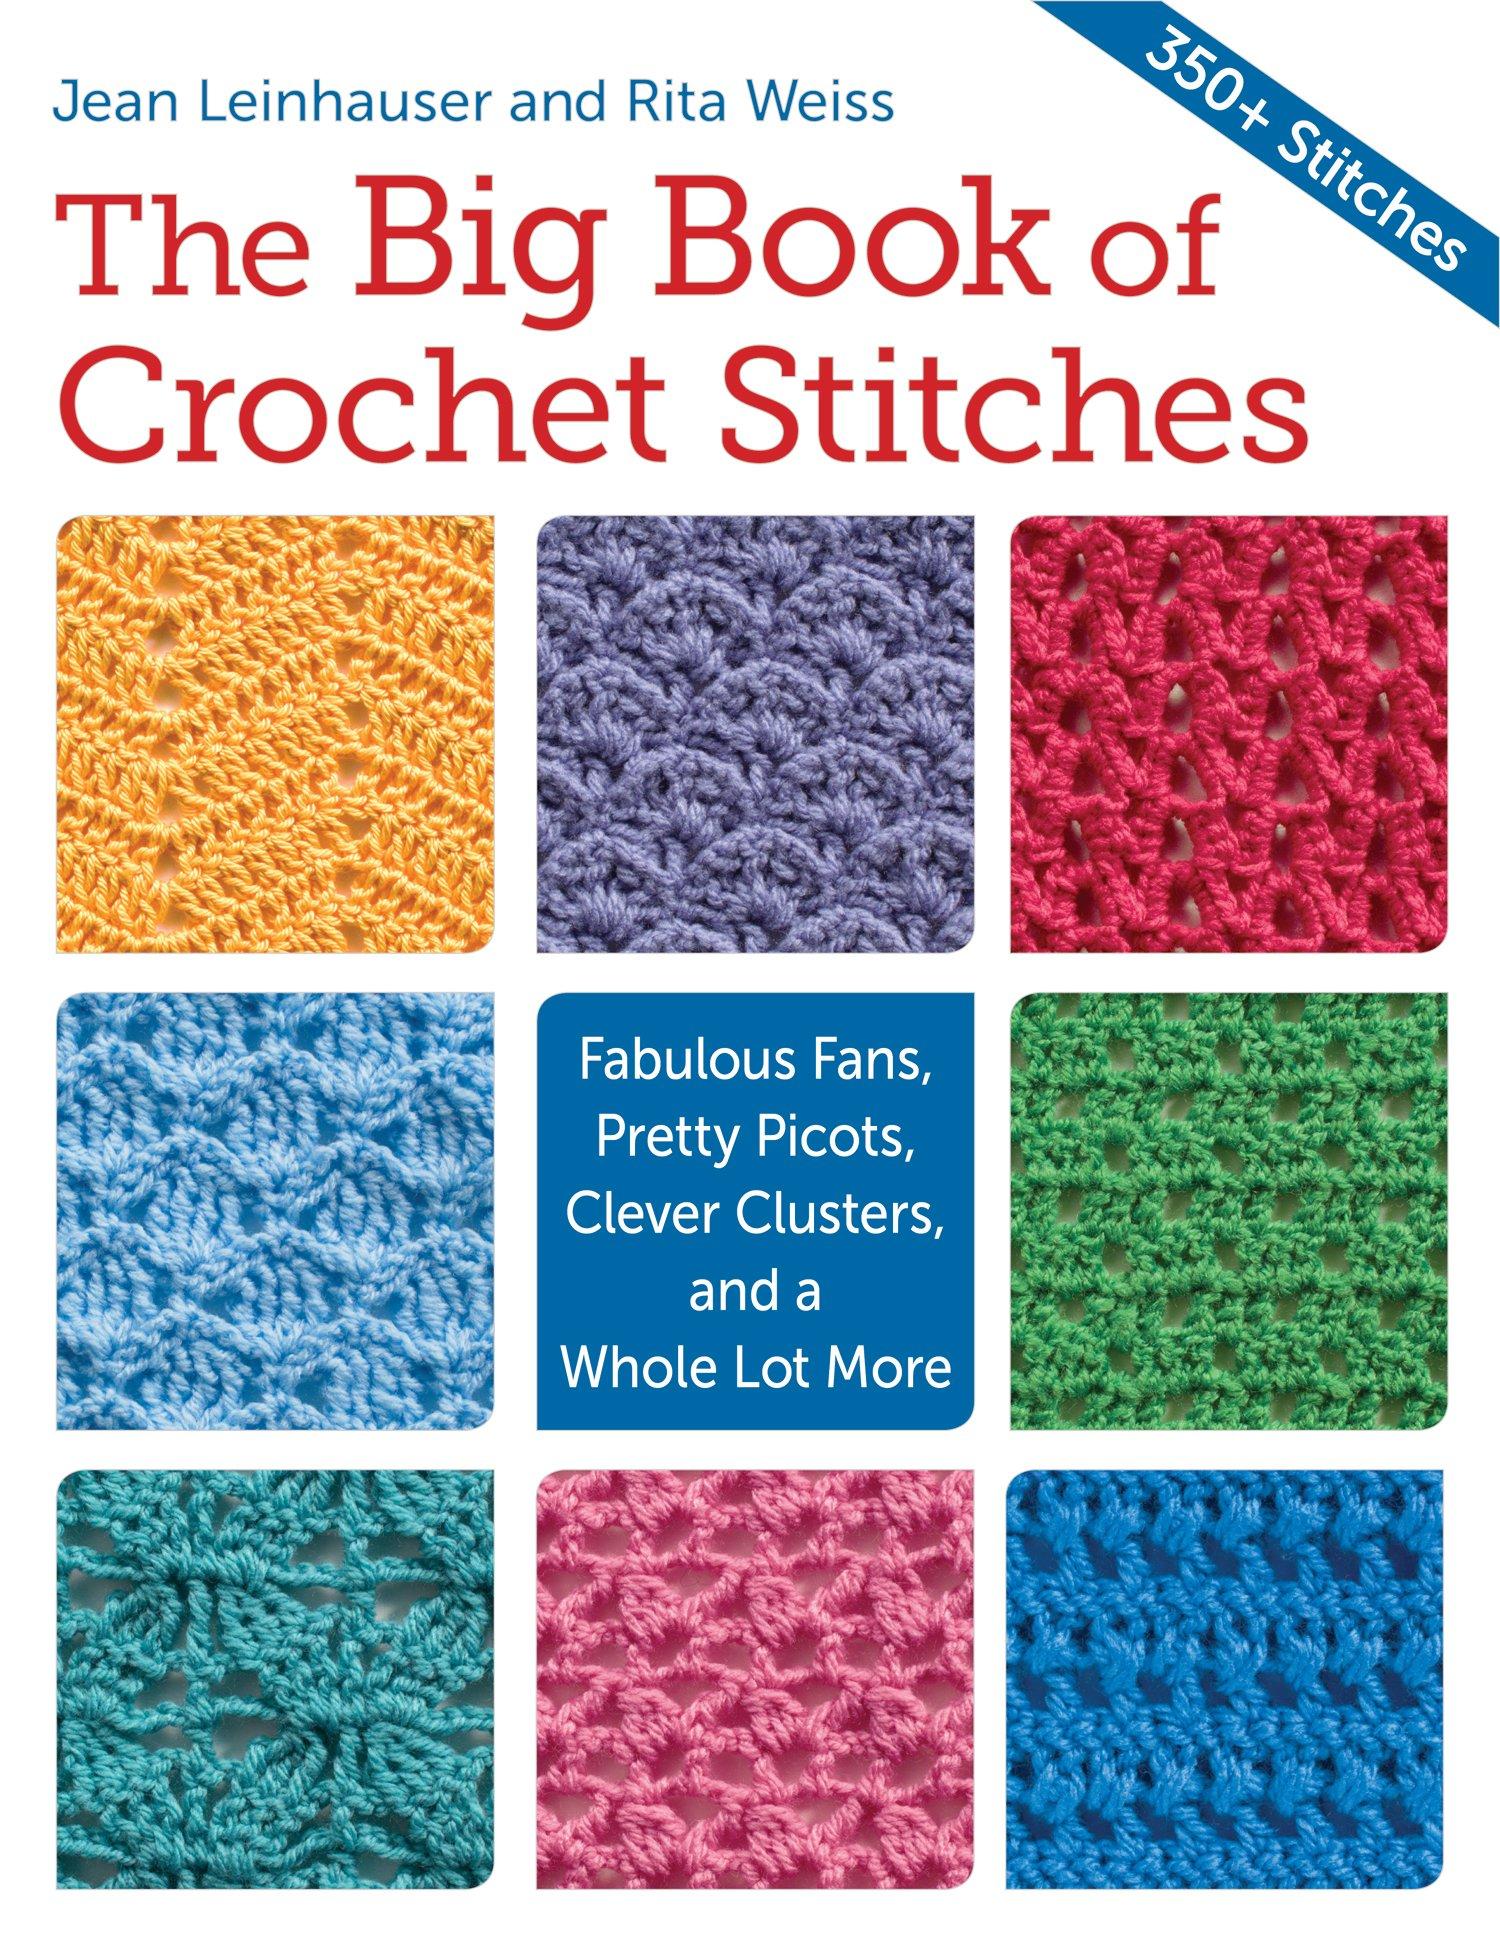 Home Decor Tutorials The Big Book Of Crochet Stitches Oombawka Design Crochet